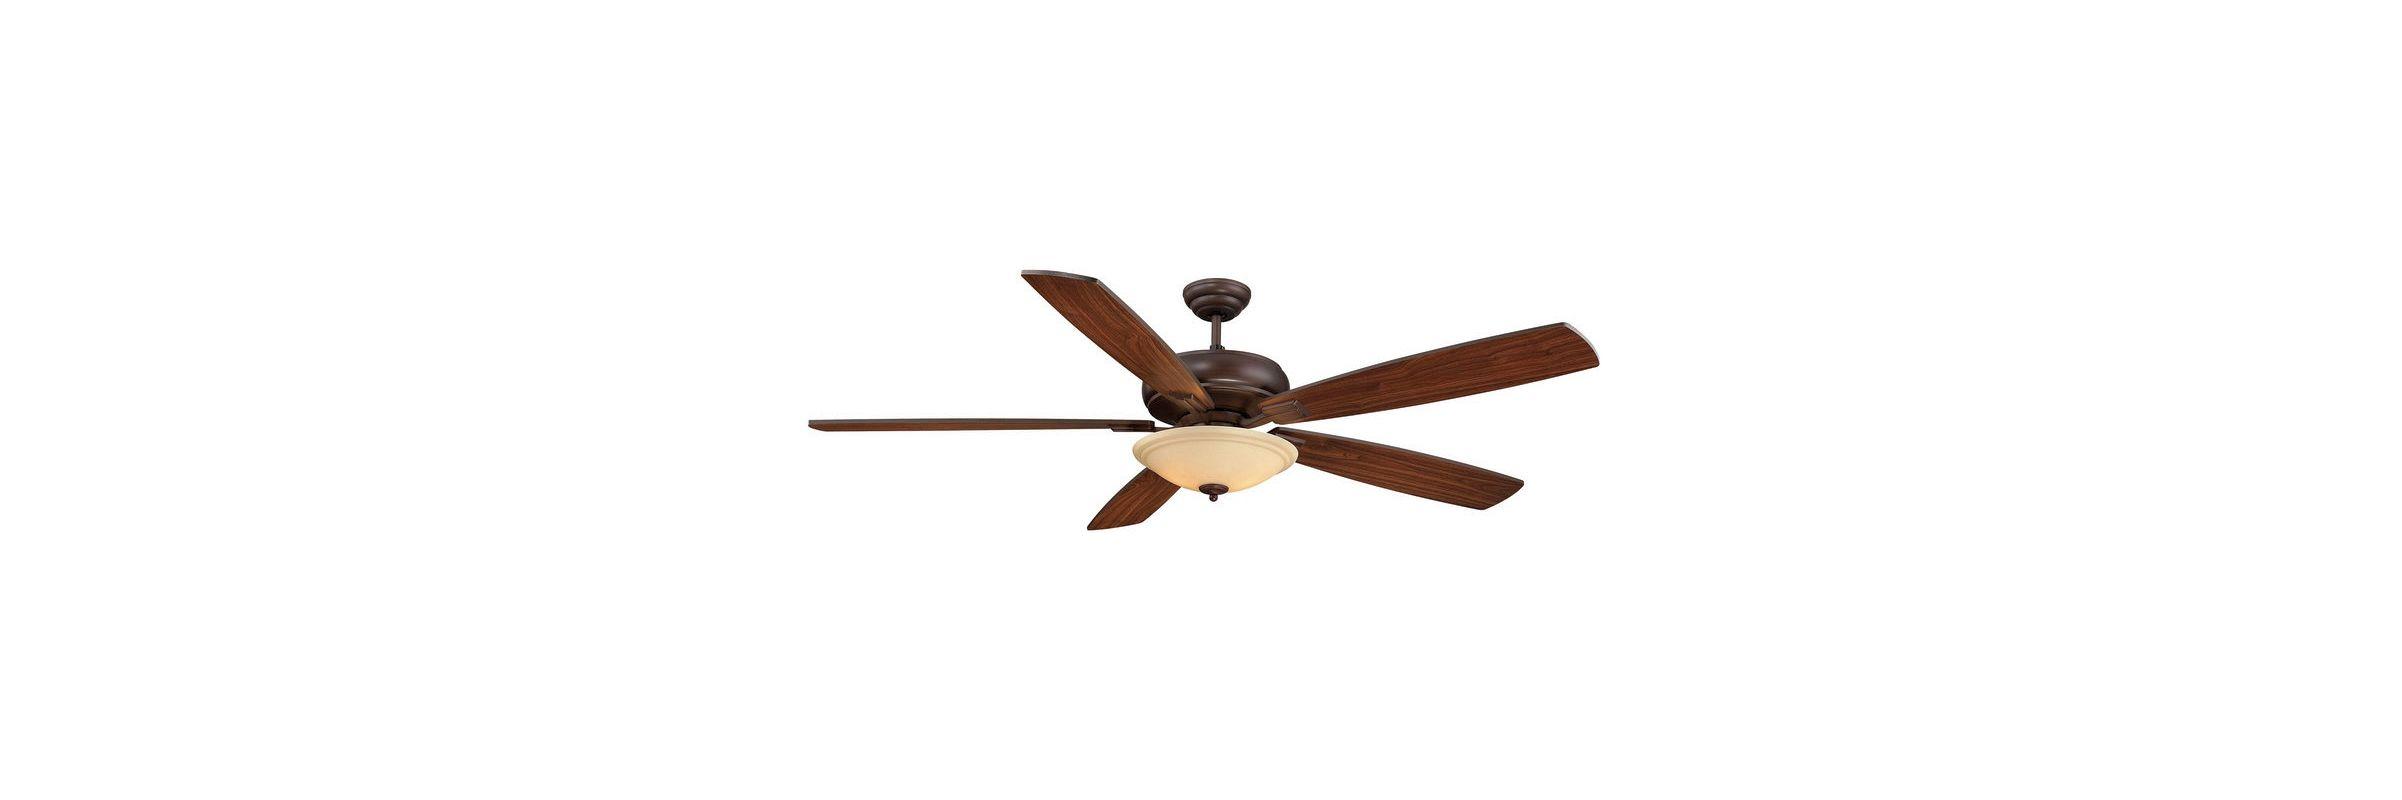 "Savoy House 68-227-5 Wind Star 68"" Span 5 Blade Indoor Ceiling Fan"